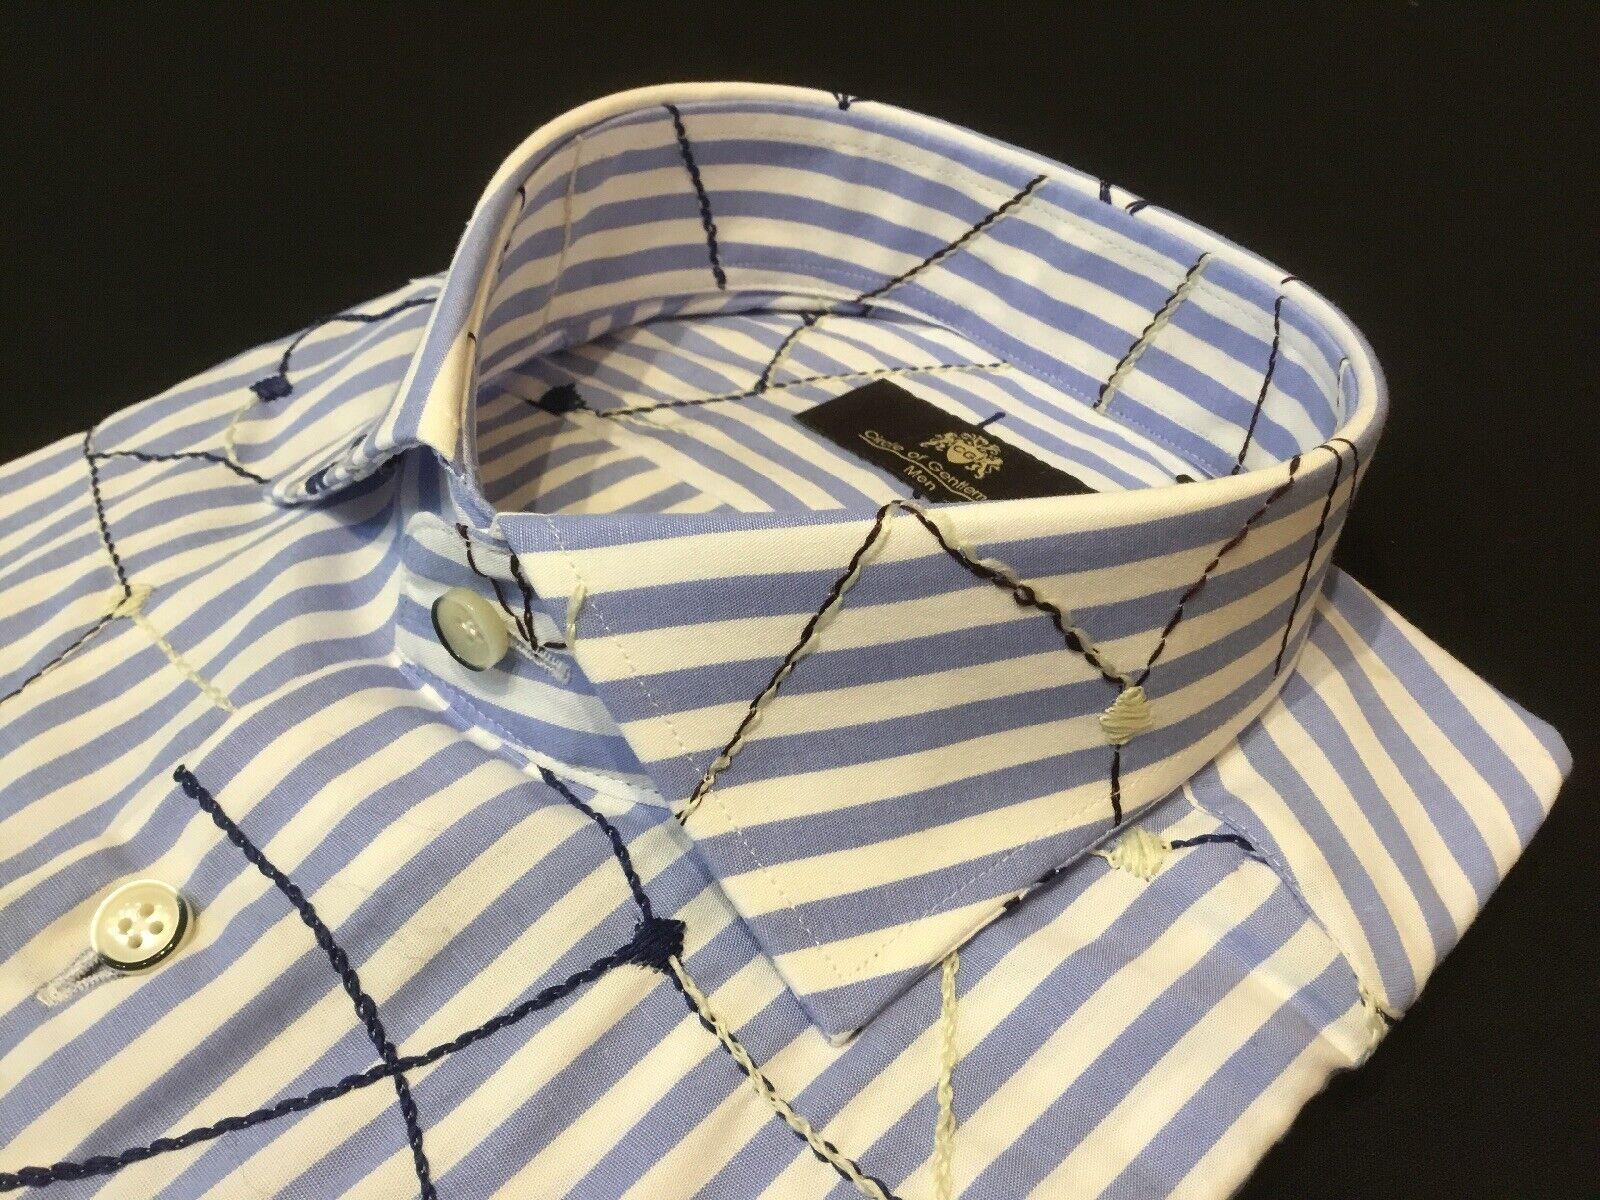 "Circle Of Gentlemänner 15 1 2""halsband 43 1 4""Chest Blau Stripe Patterned hemd"